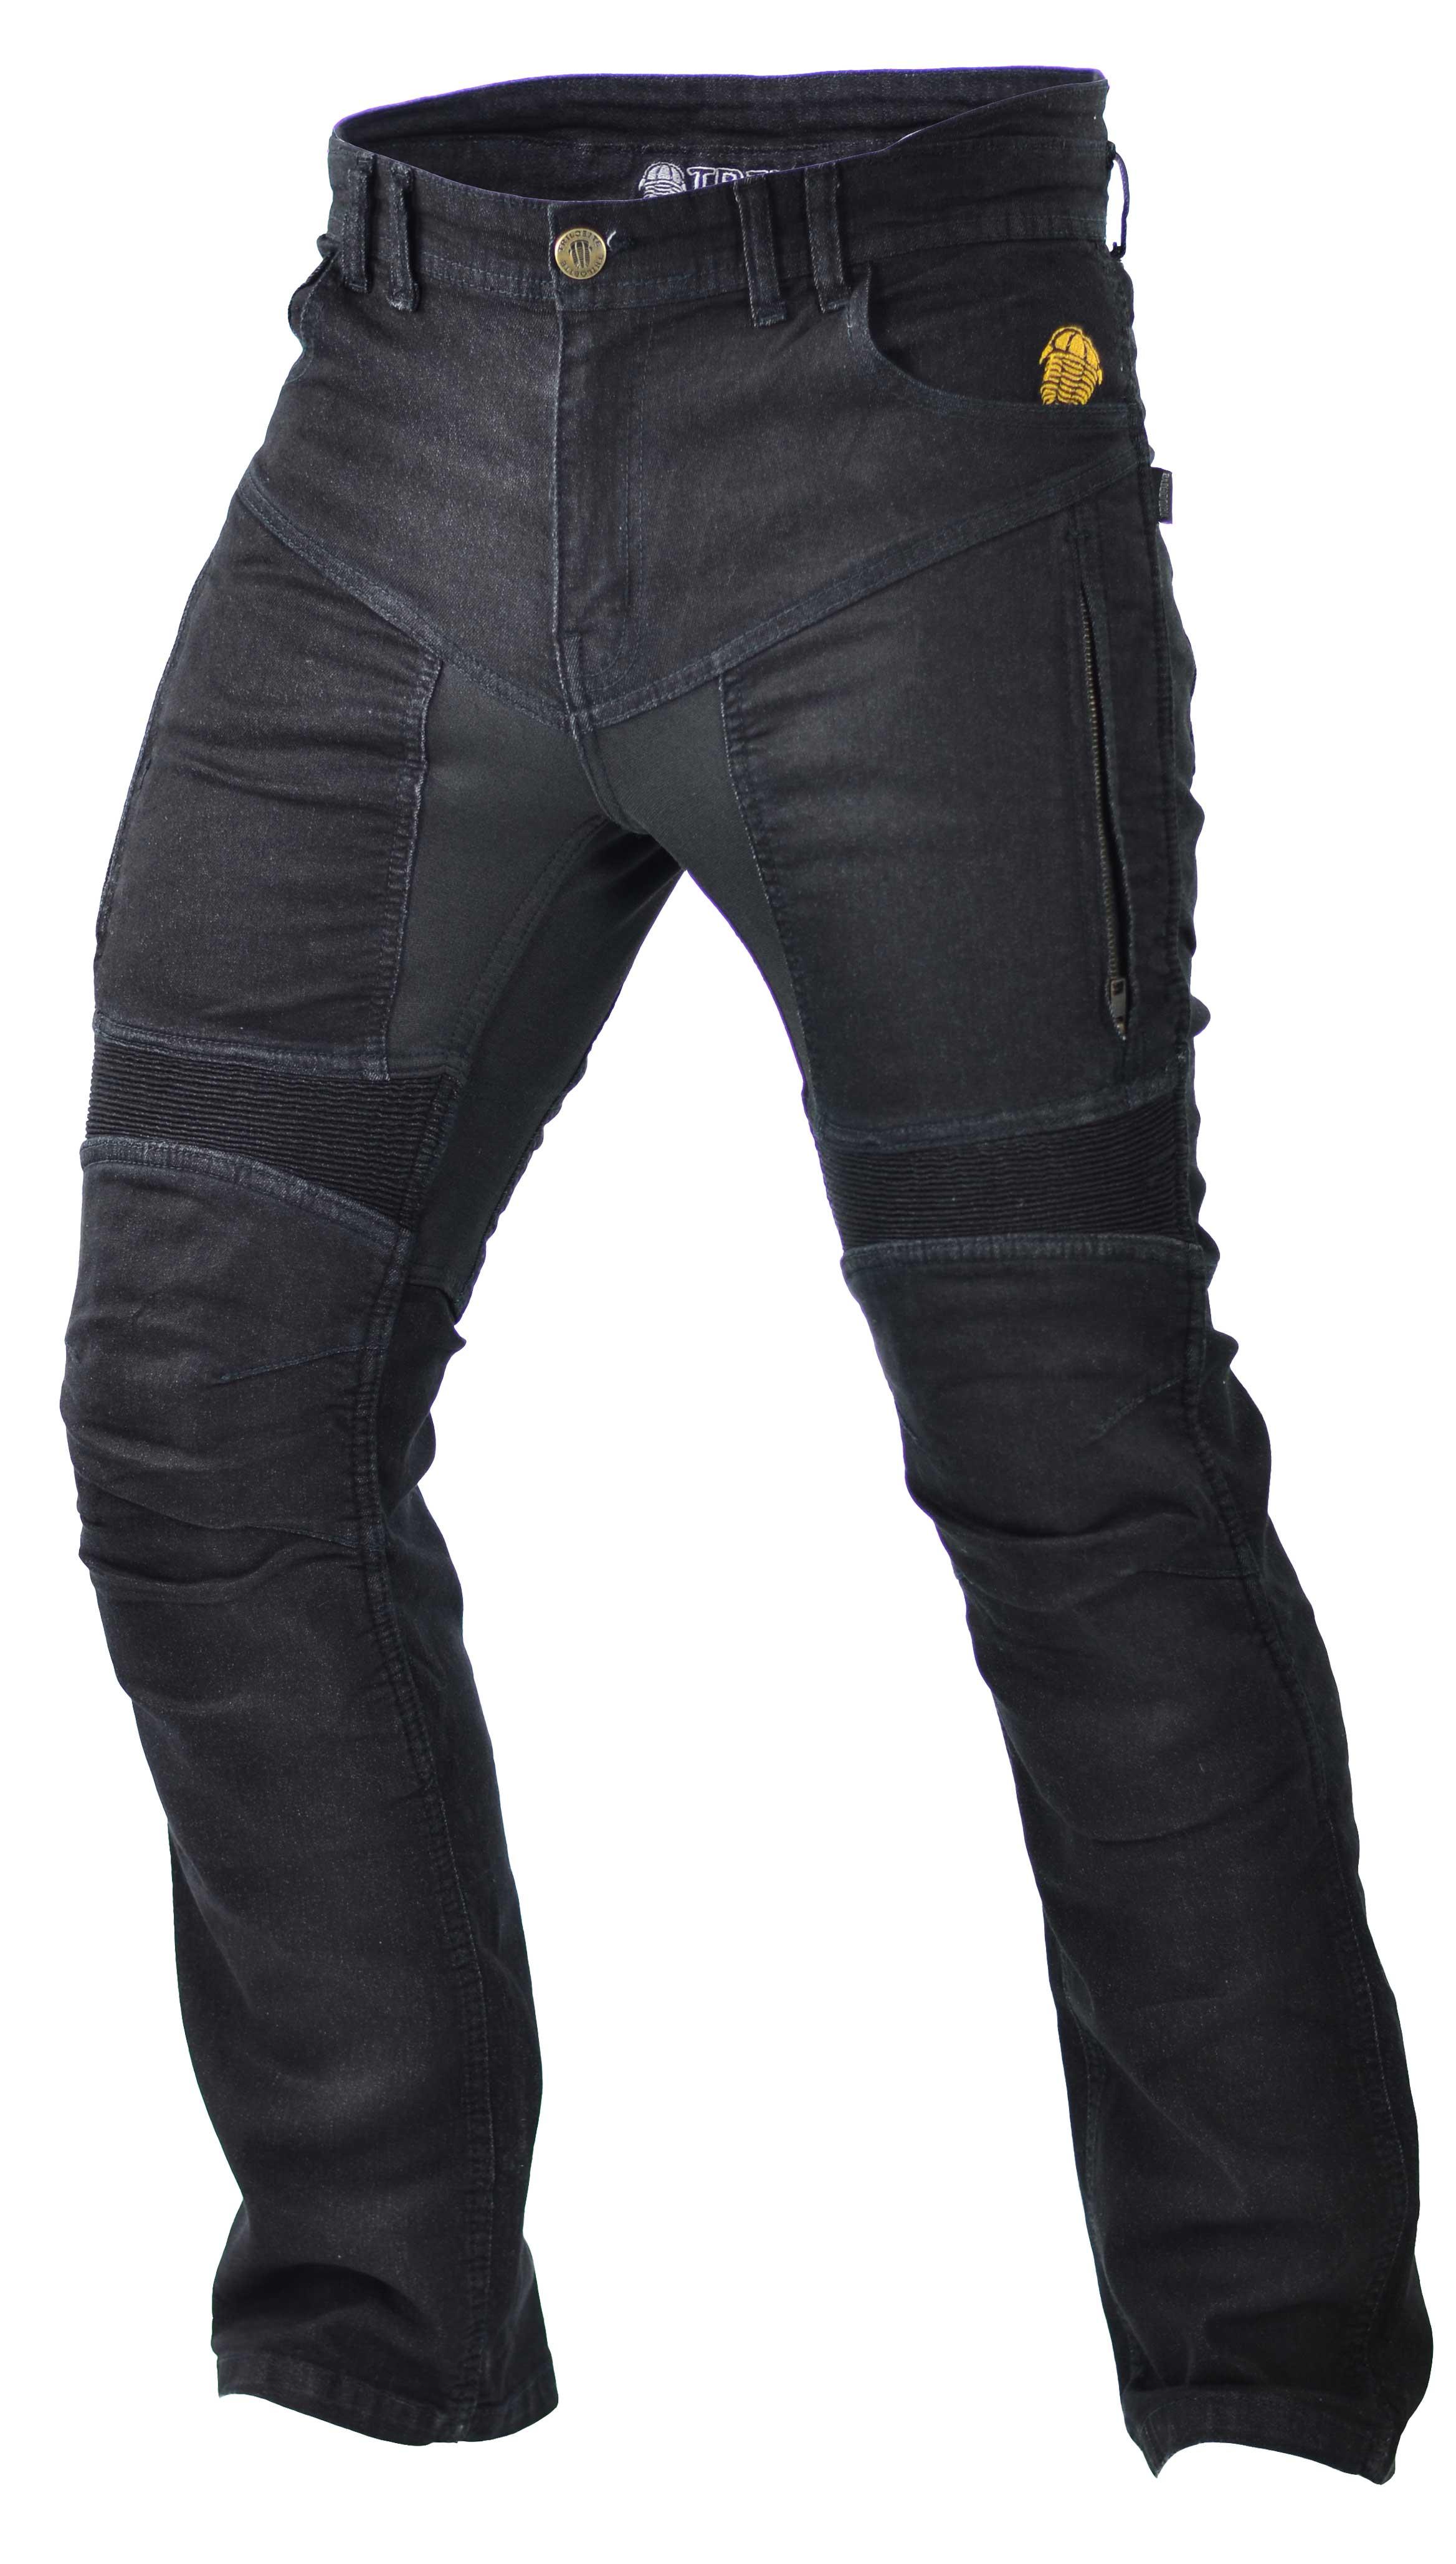 trilobite parado kevlar jeanshose herren schwarz cs bikewear. Black Bedroom Furniture Sets. Home Design Ideas